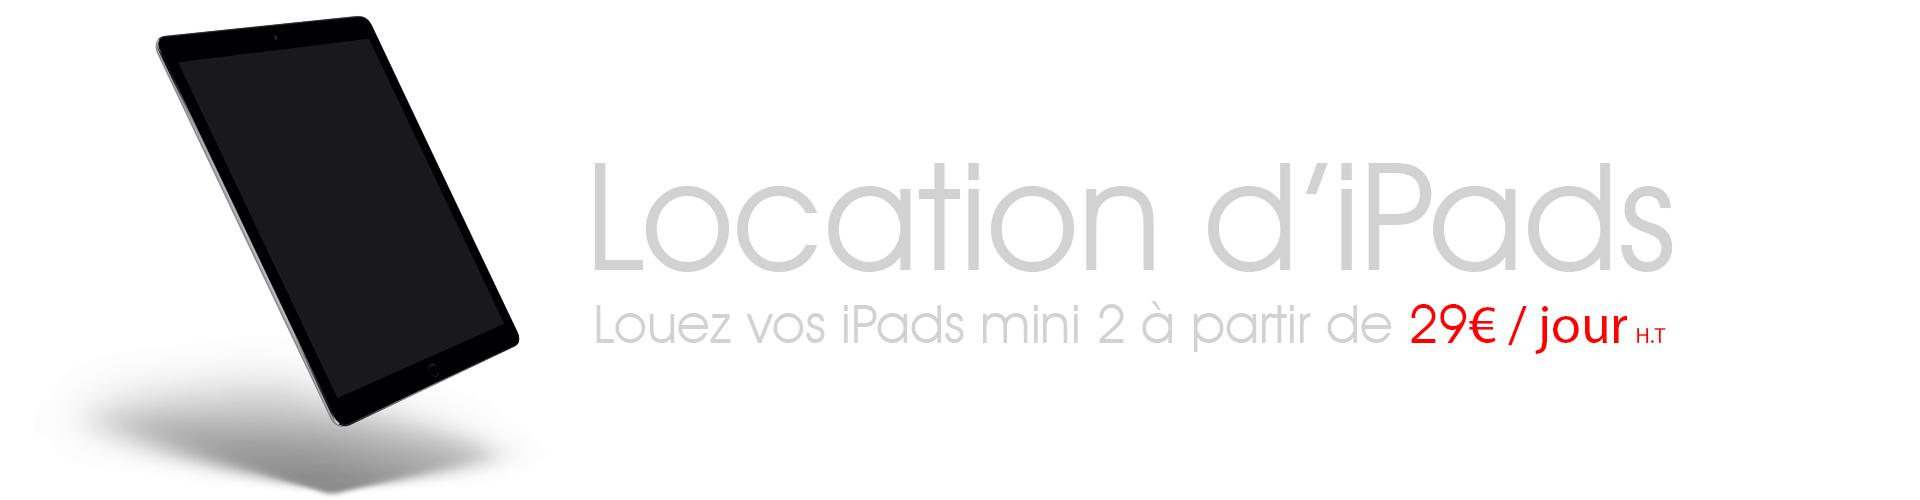 MobilActif location iPads